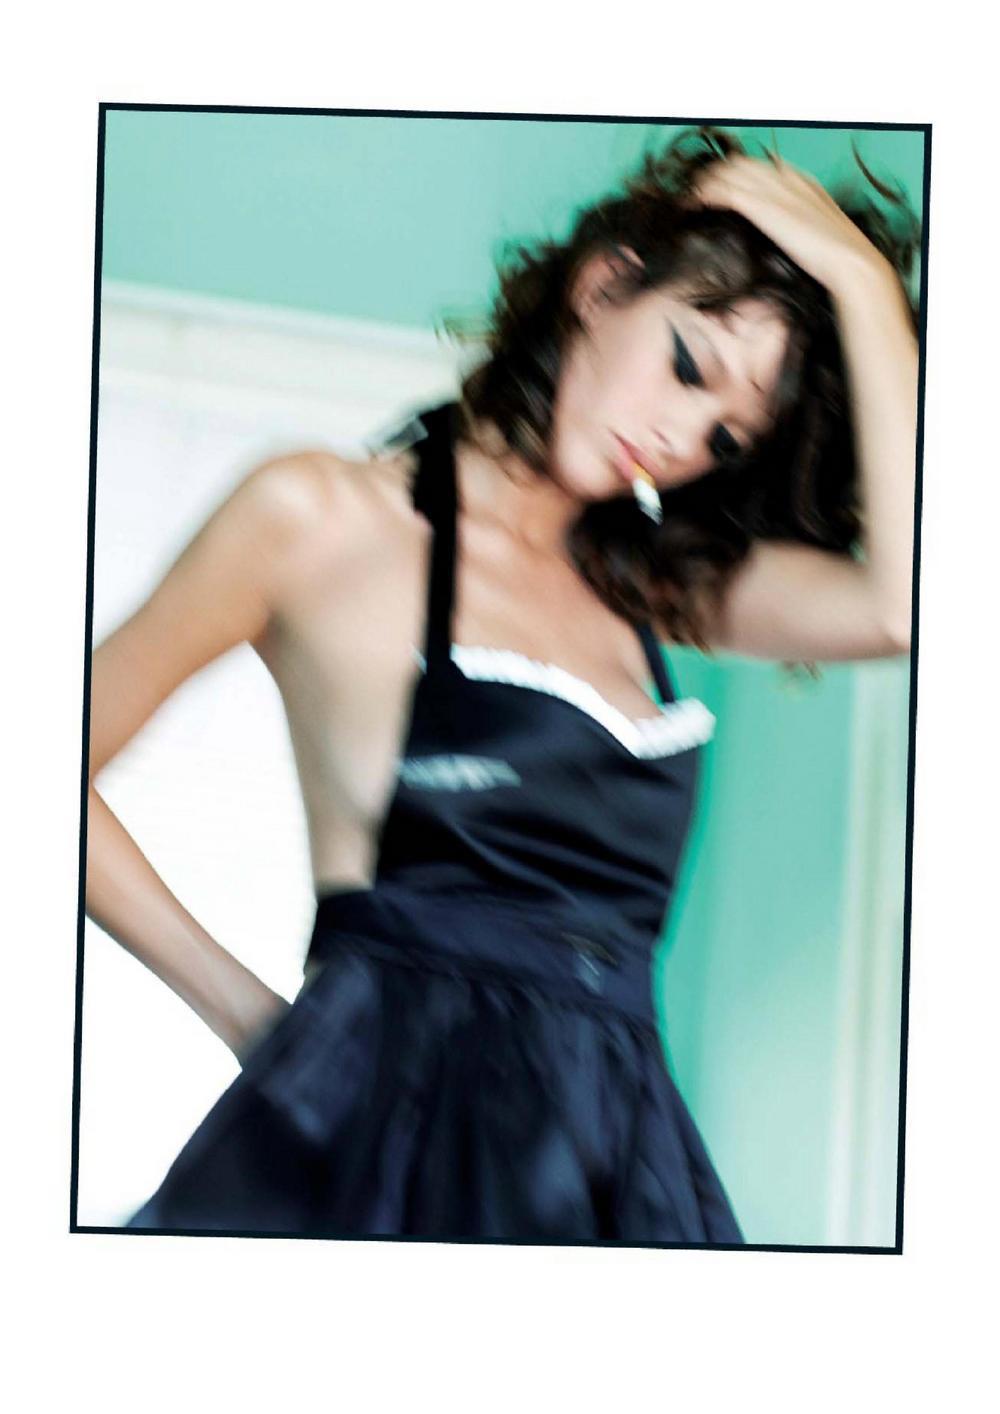 Online schools for fashion merchandising 56